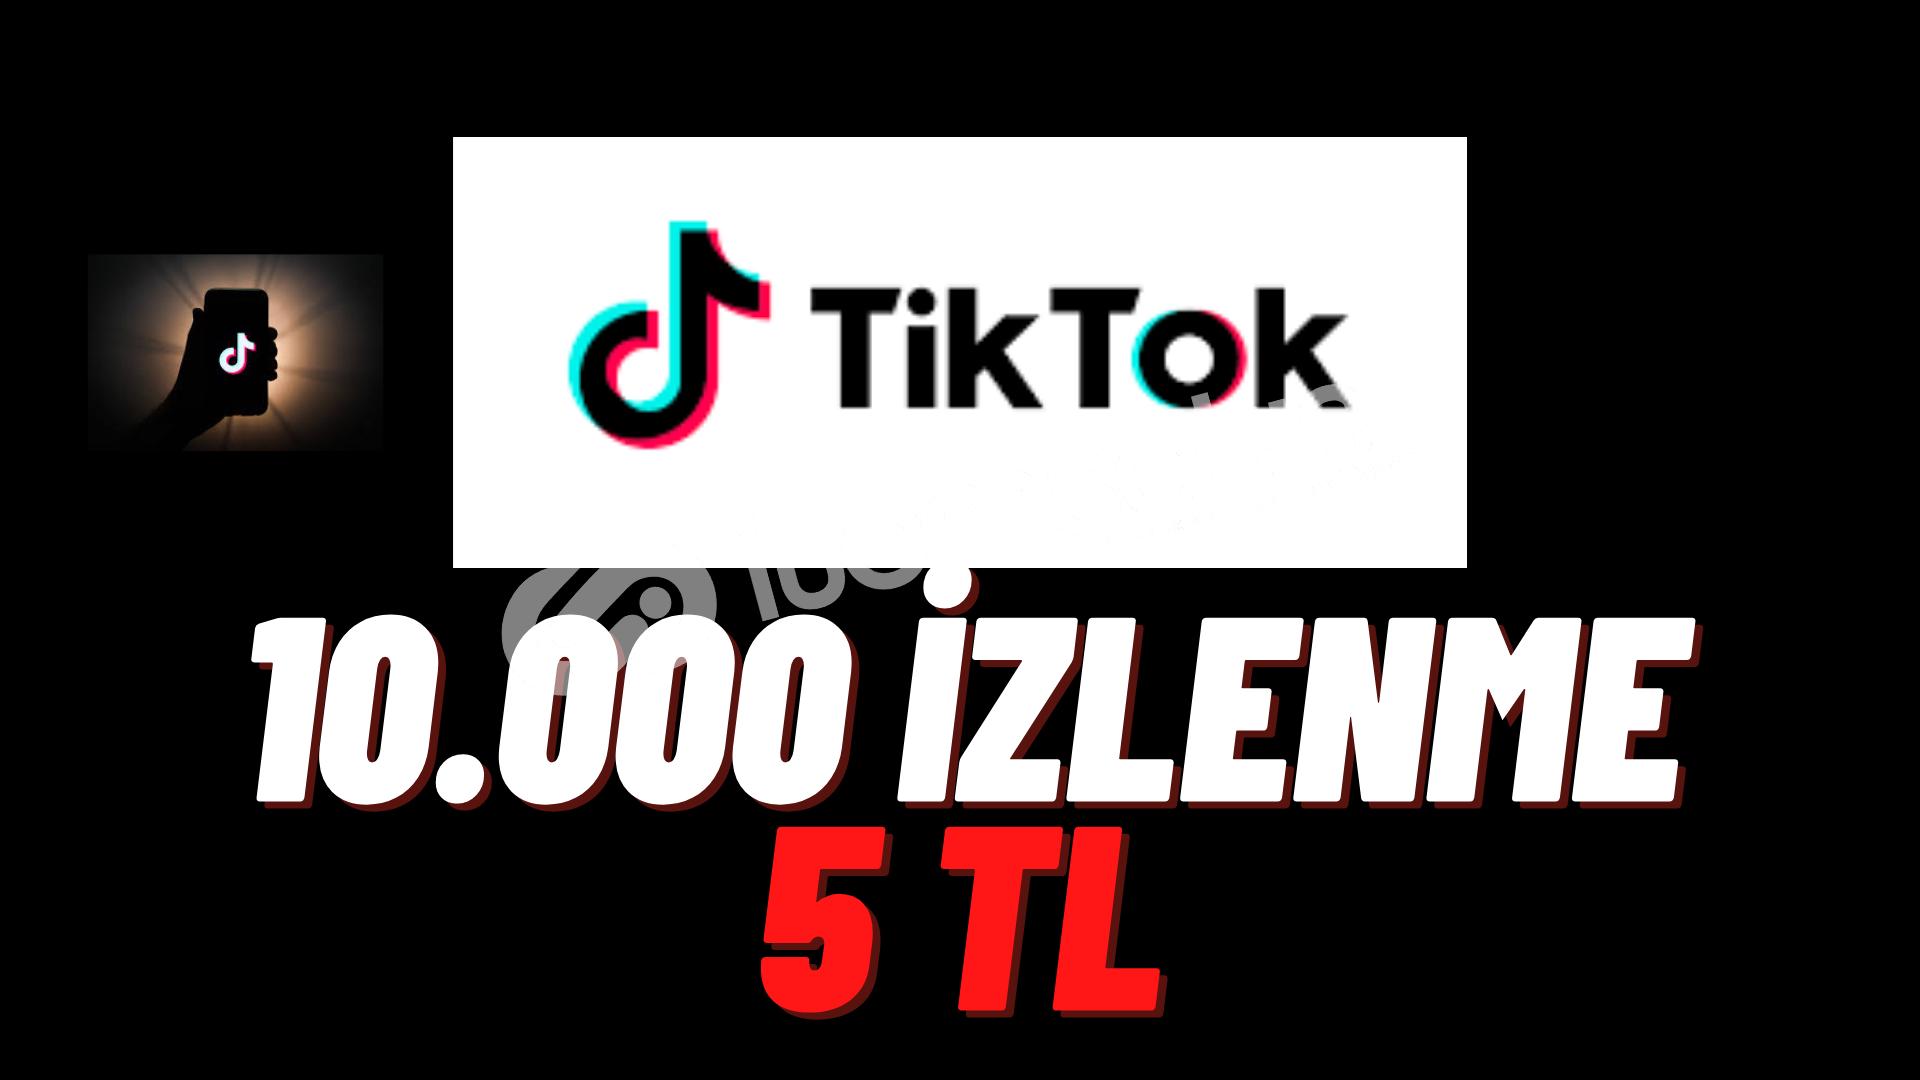 TİKTOK 10.000 İZLENME